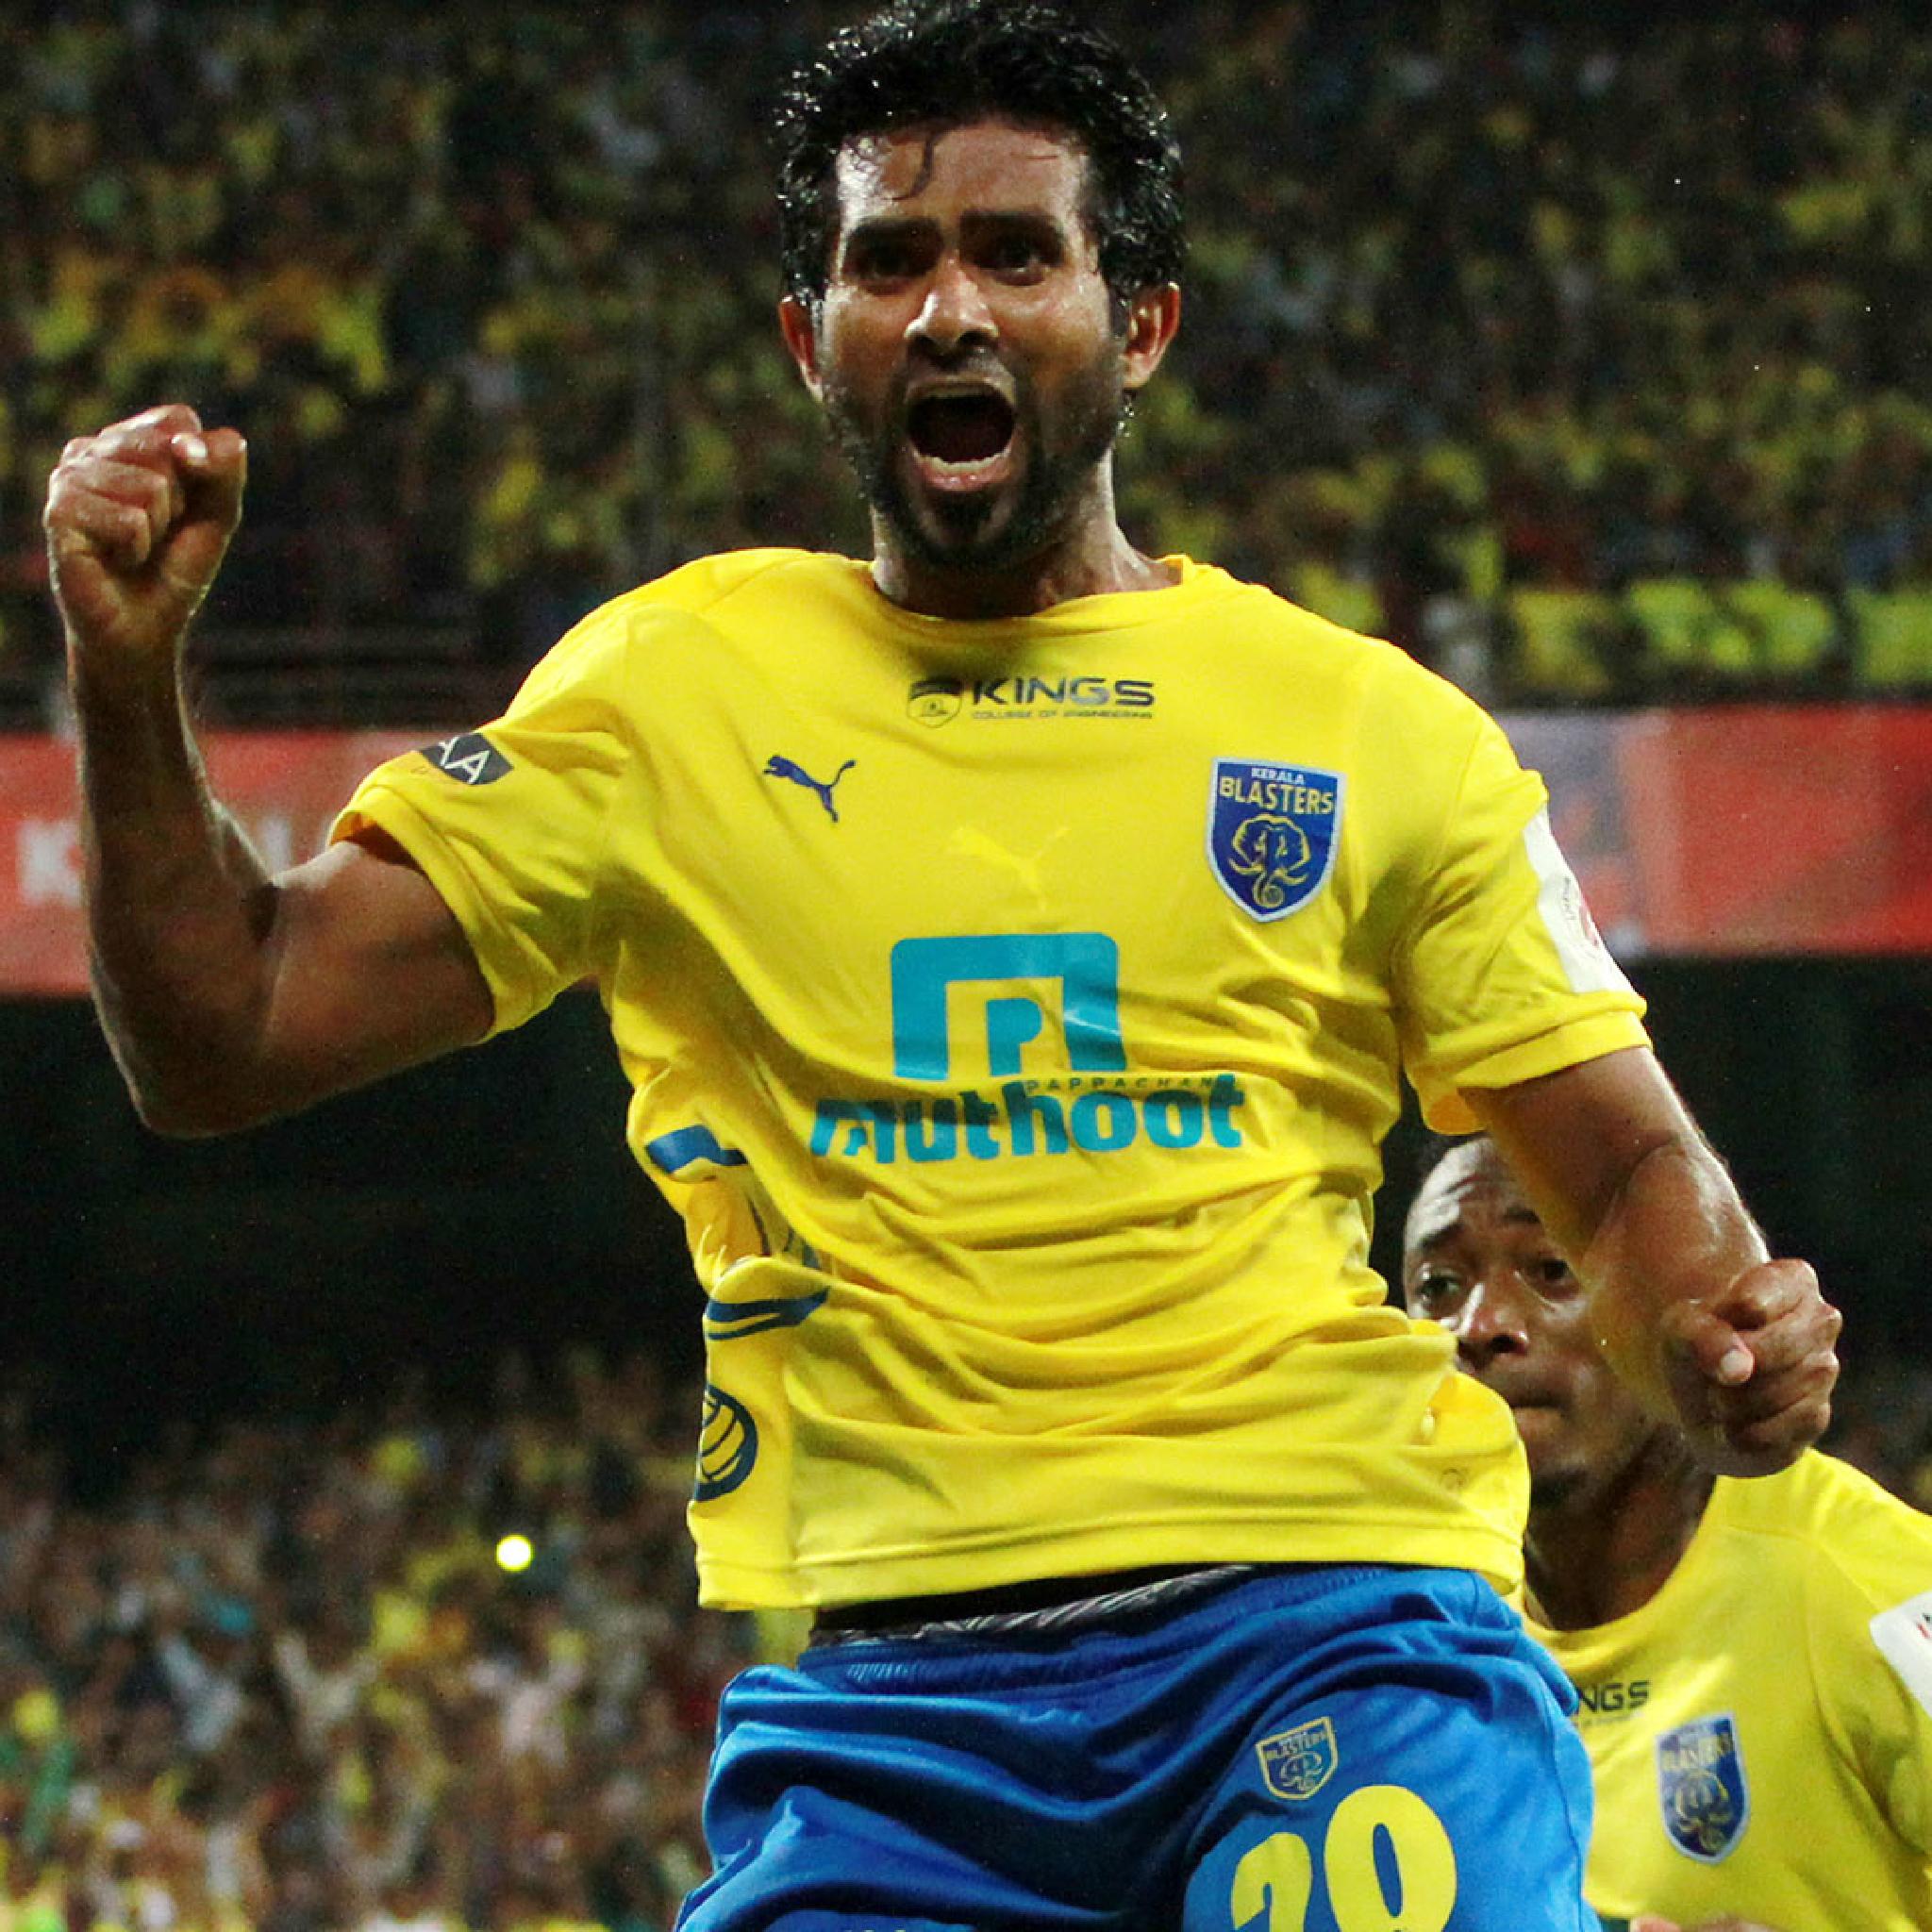 Hd Wallpapers   Kerala Blasters Football Player Png Hd Wallpapers 2048x2048